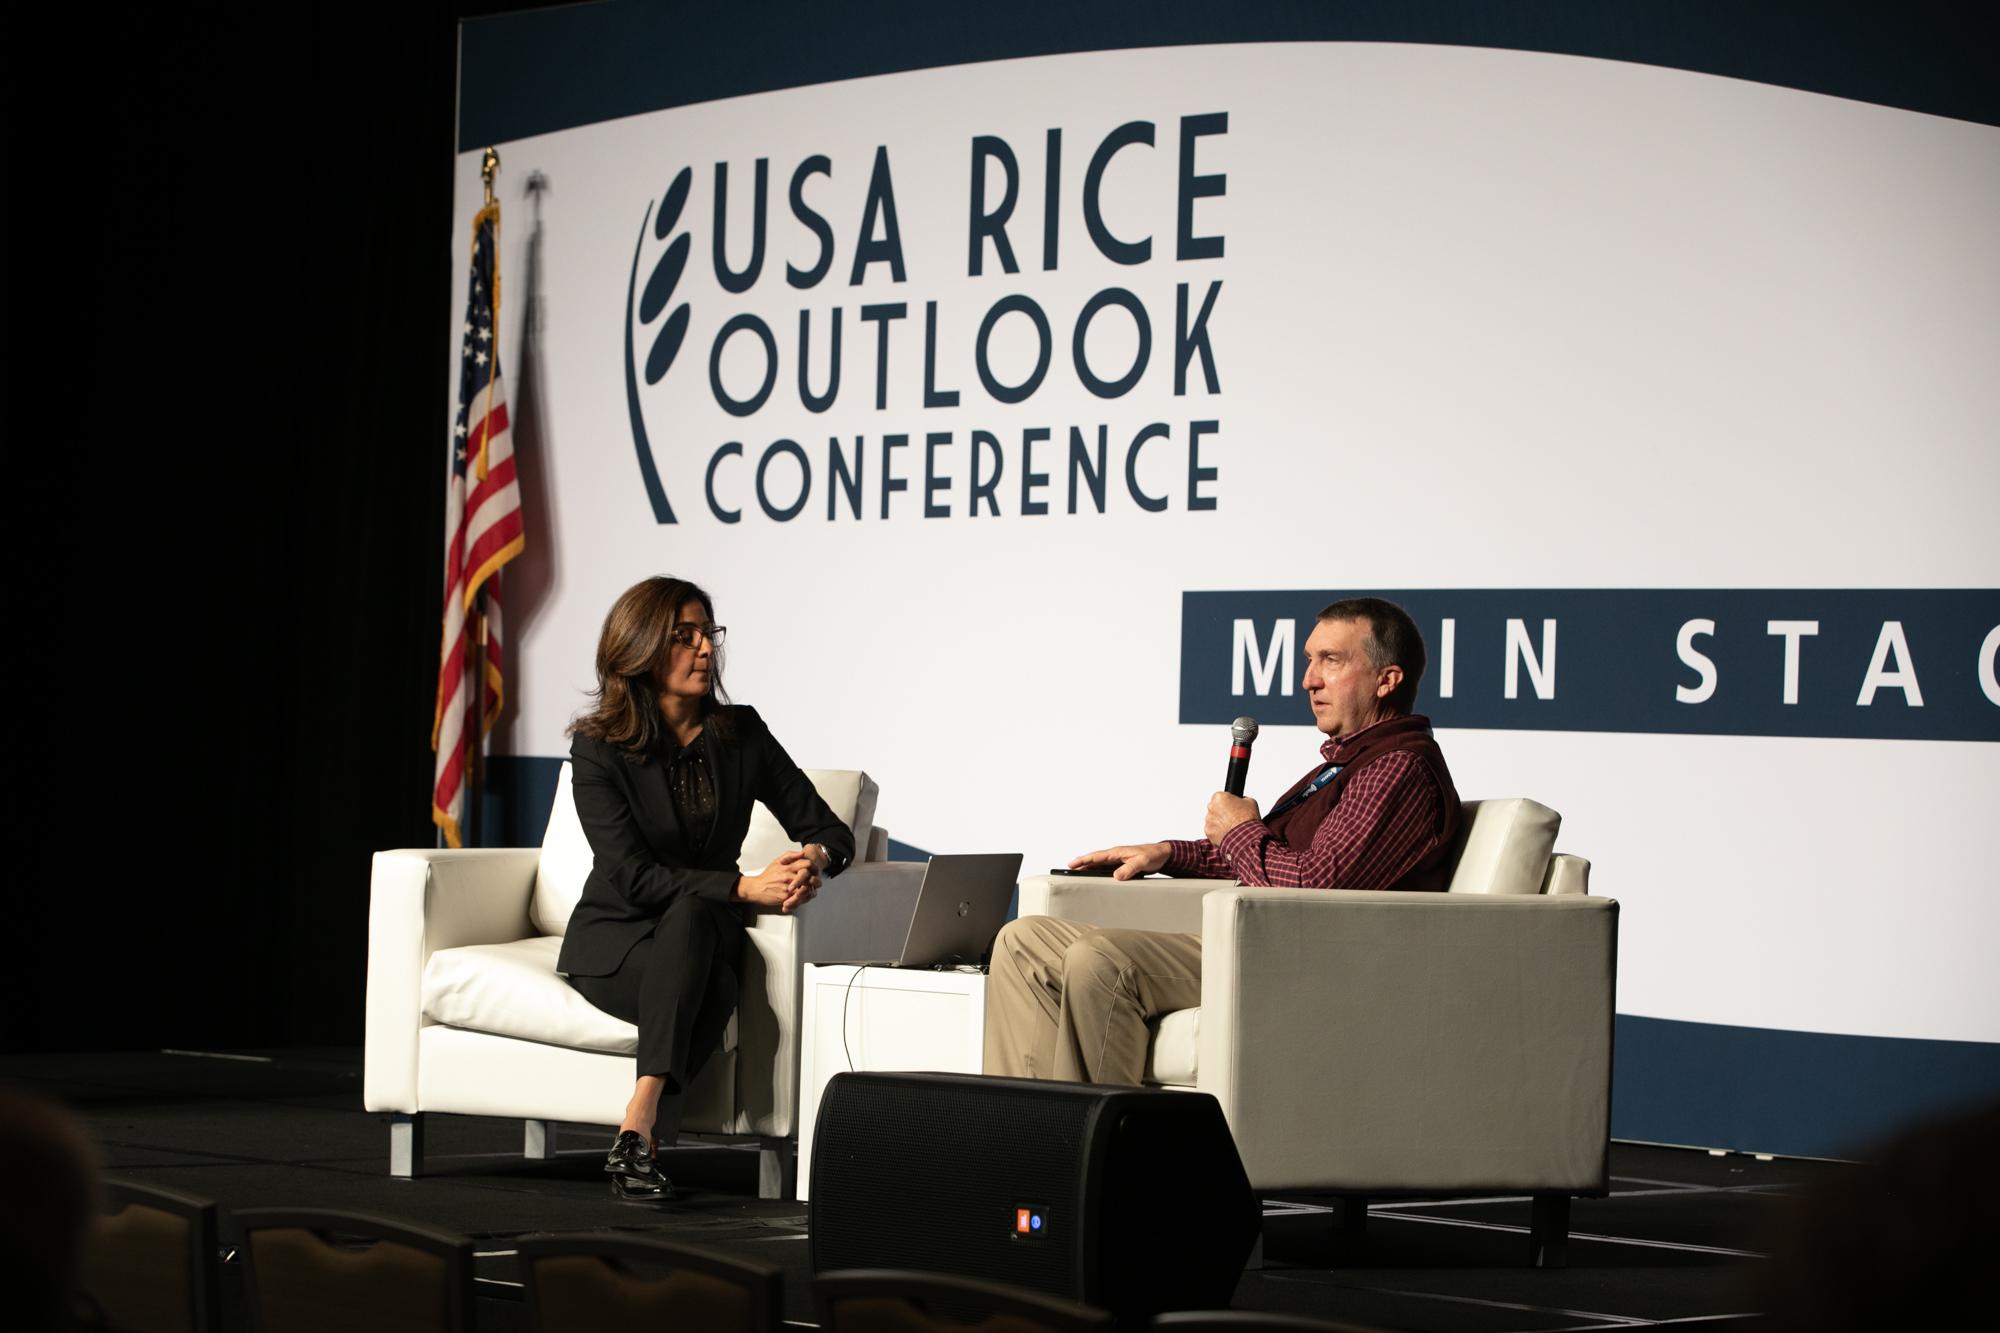 Keynote speaker Dr. Shimi Kang talking stress with Arkansas farmer Mike Sullivan